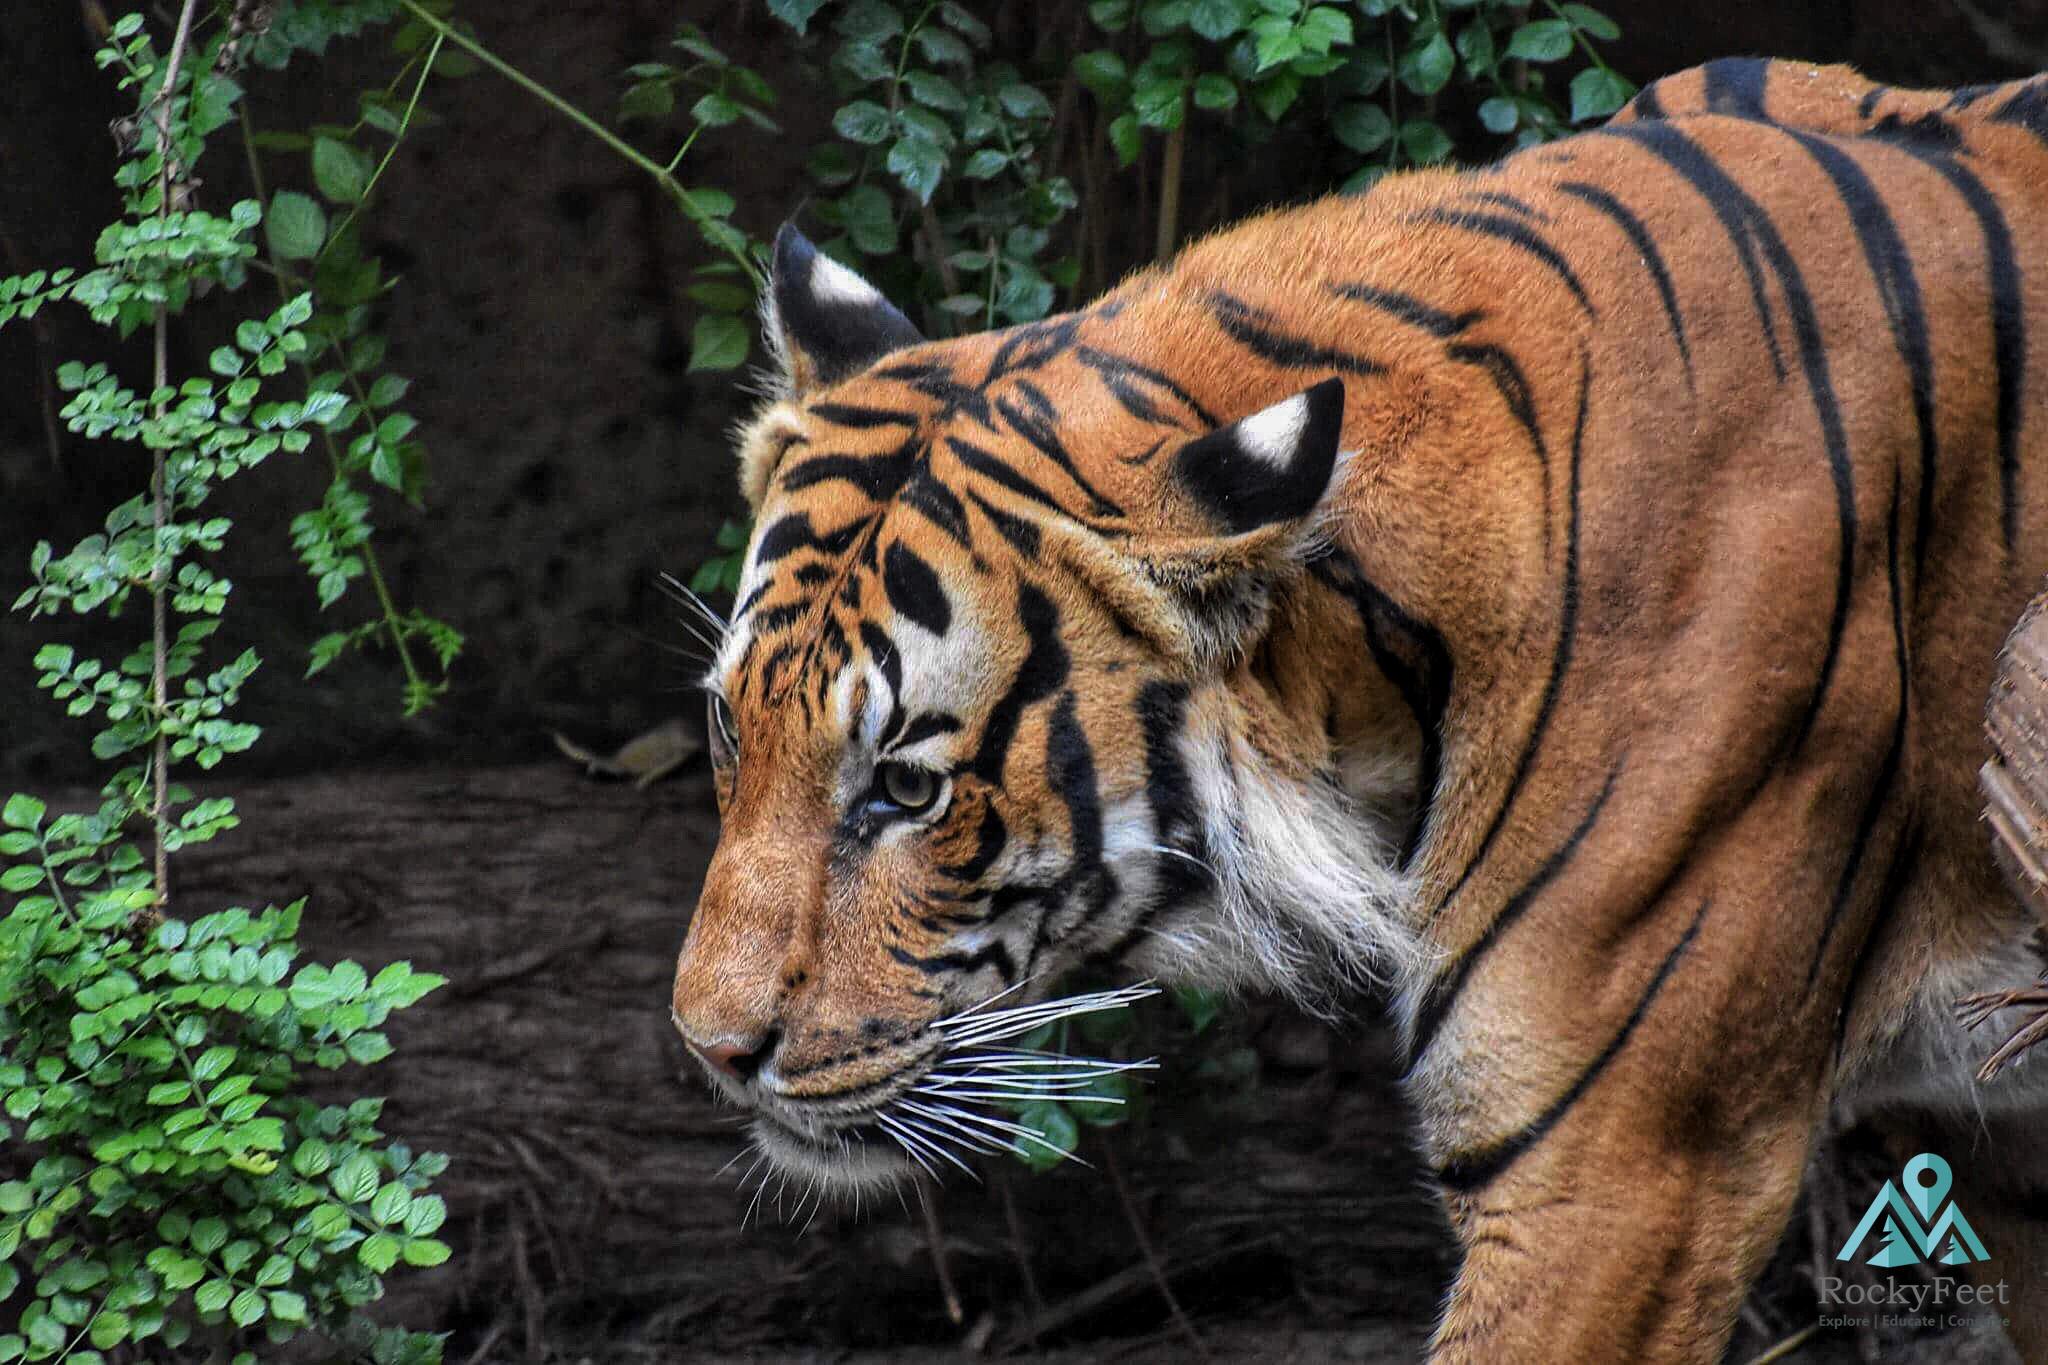 RockyFeet Sundarbans